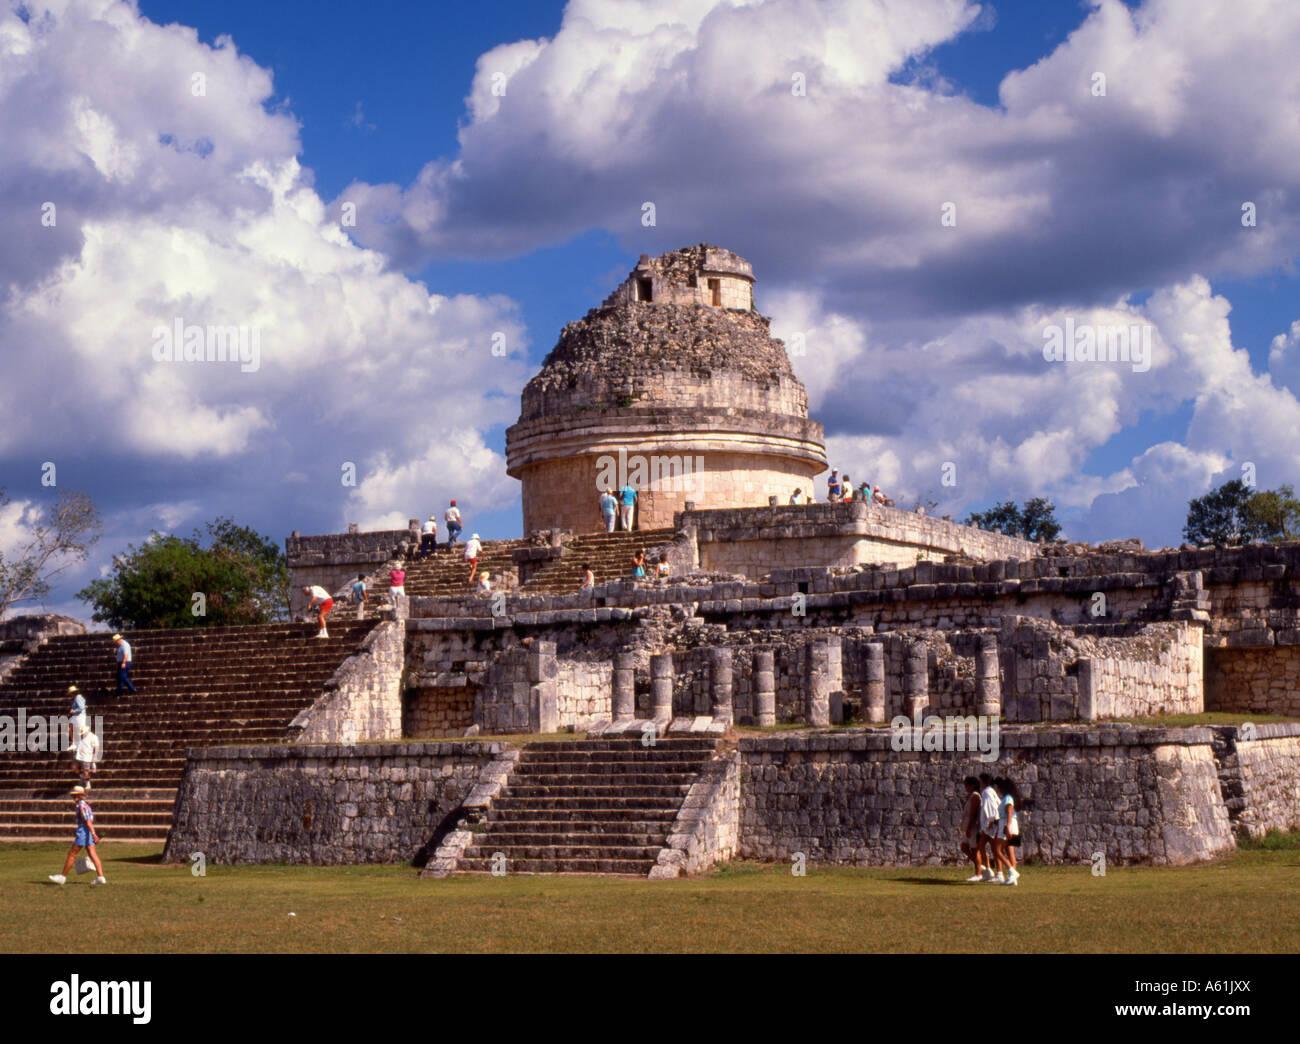 Mexico Yucatan Chichen Itza Observatory Mayan ruins - Stock Image